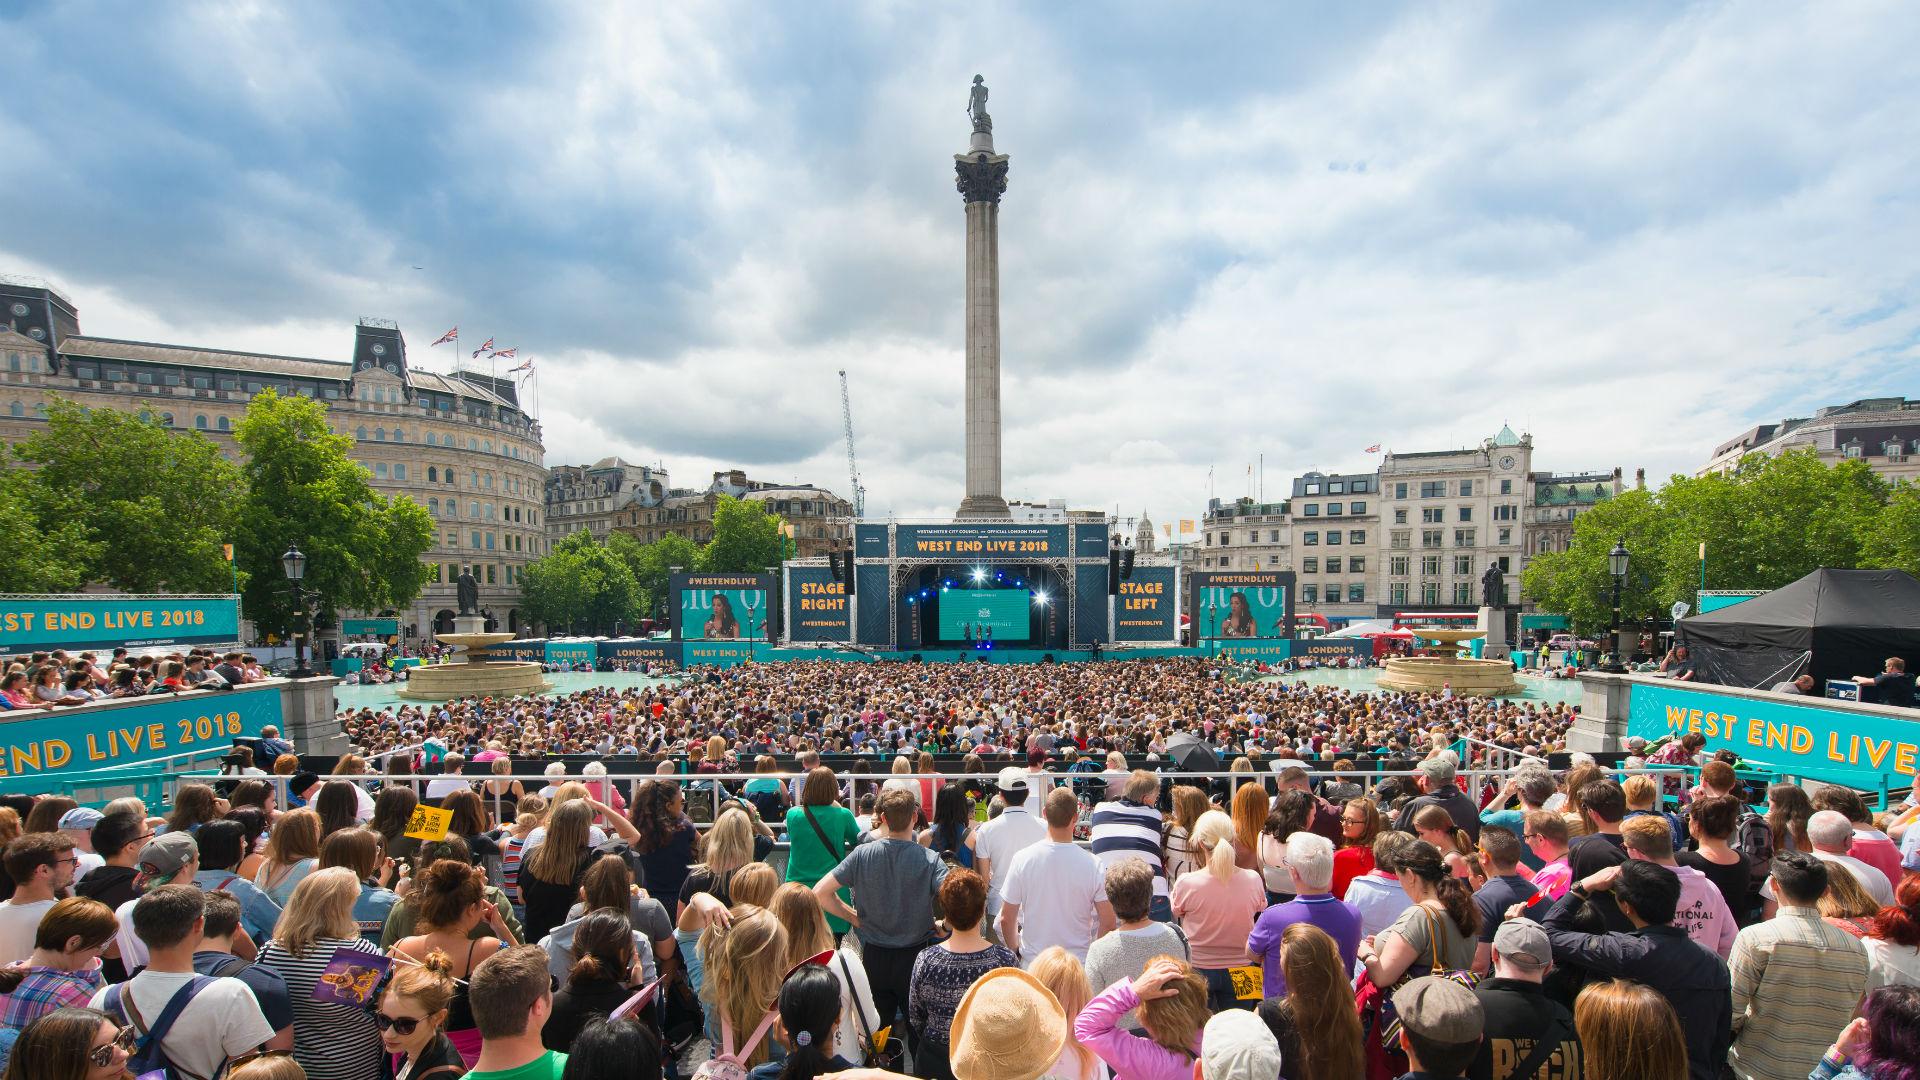 A large crowd enjoys free performances during West End LIVE